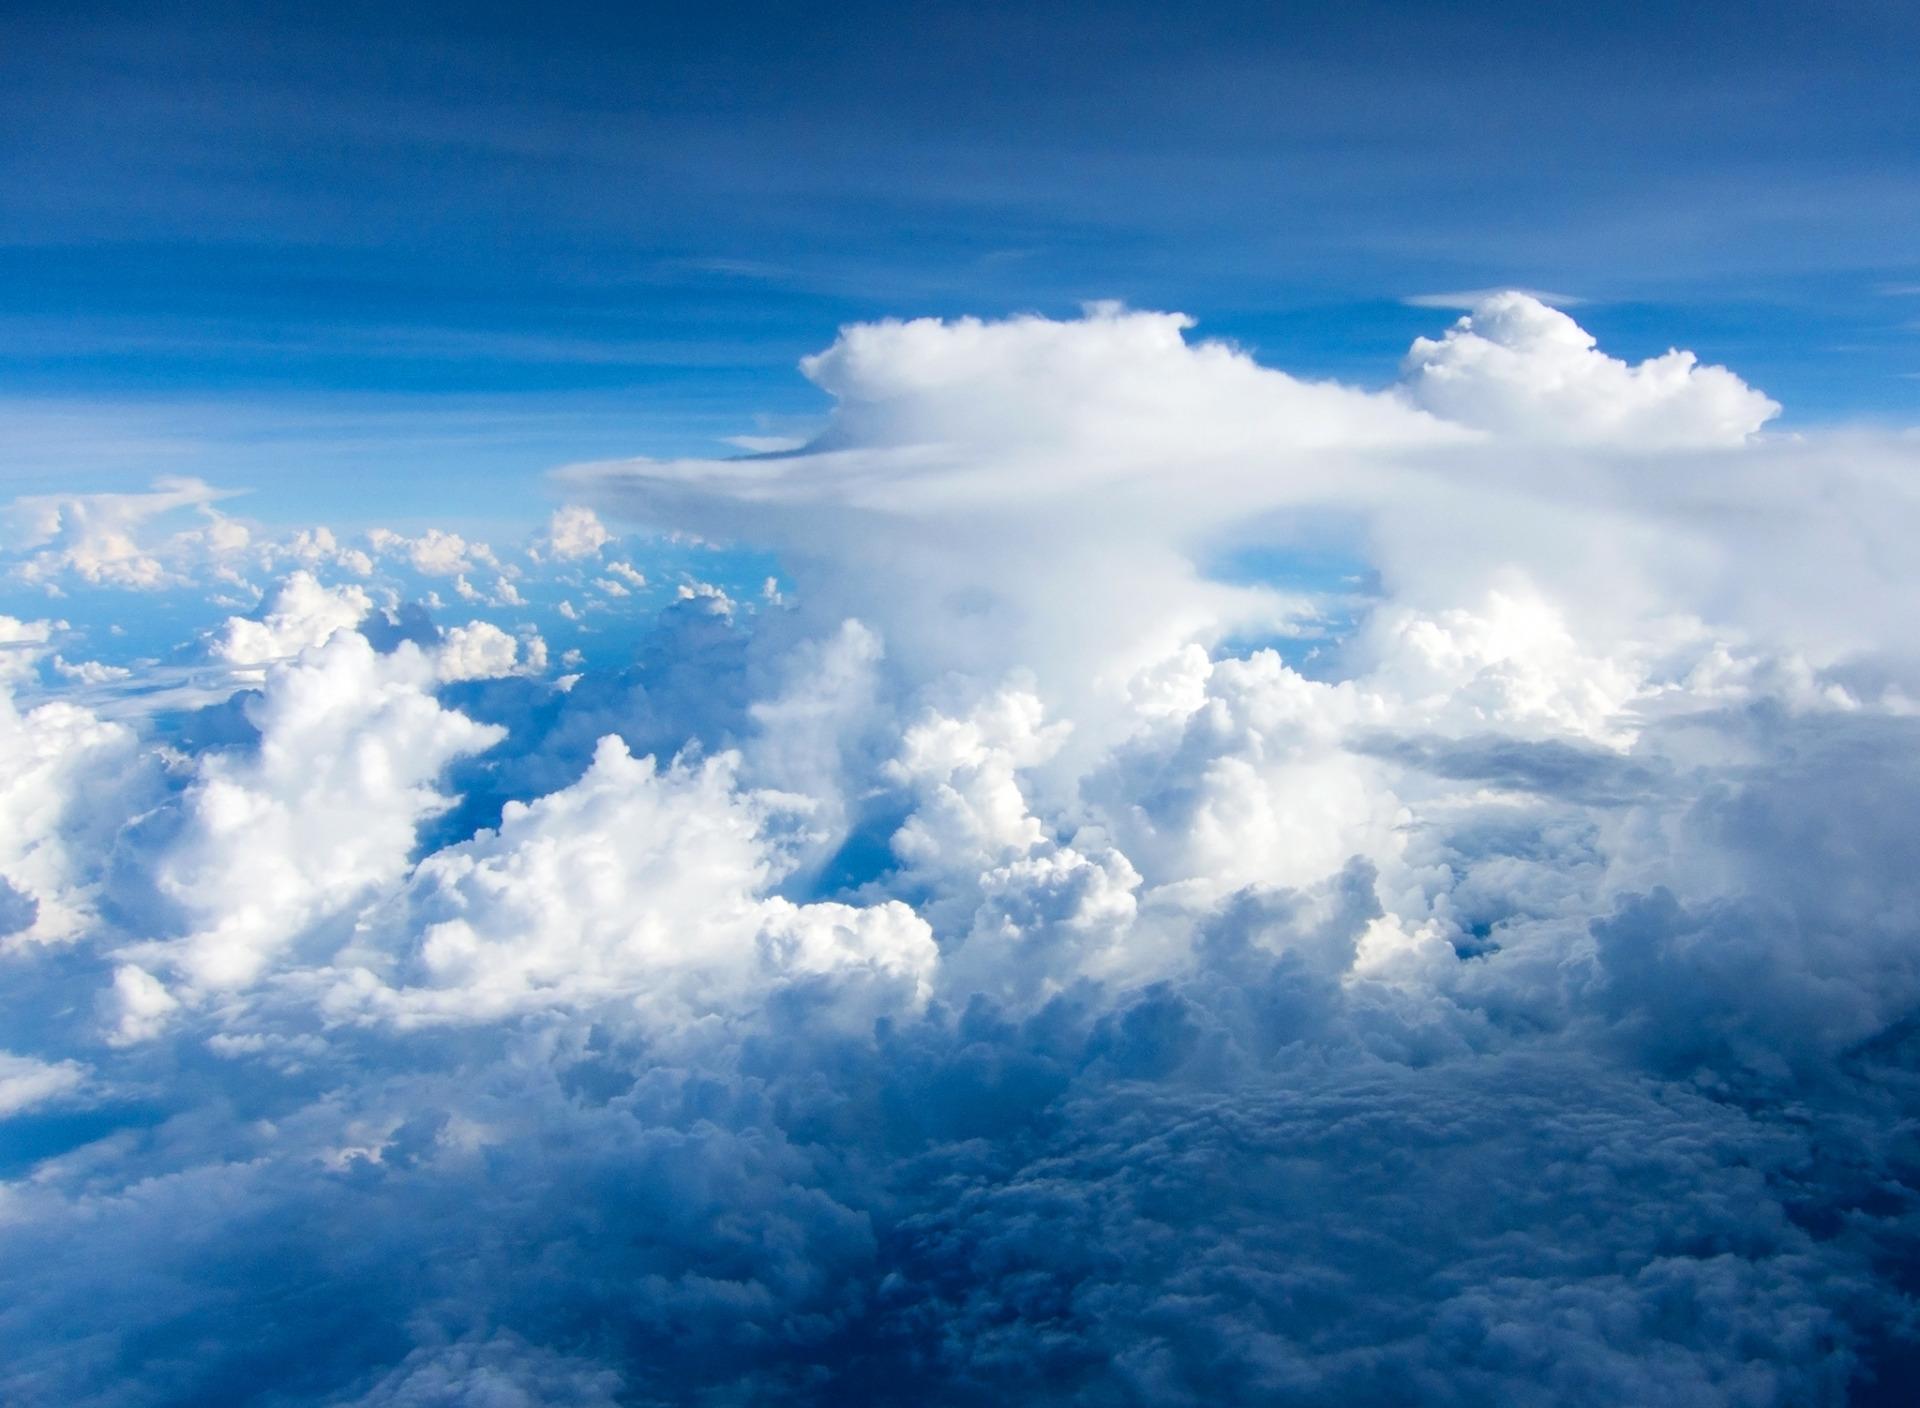 Картинка небо и облака, красивые